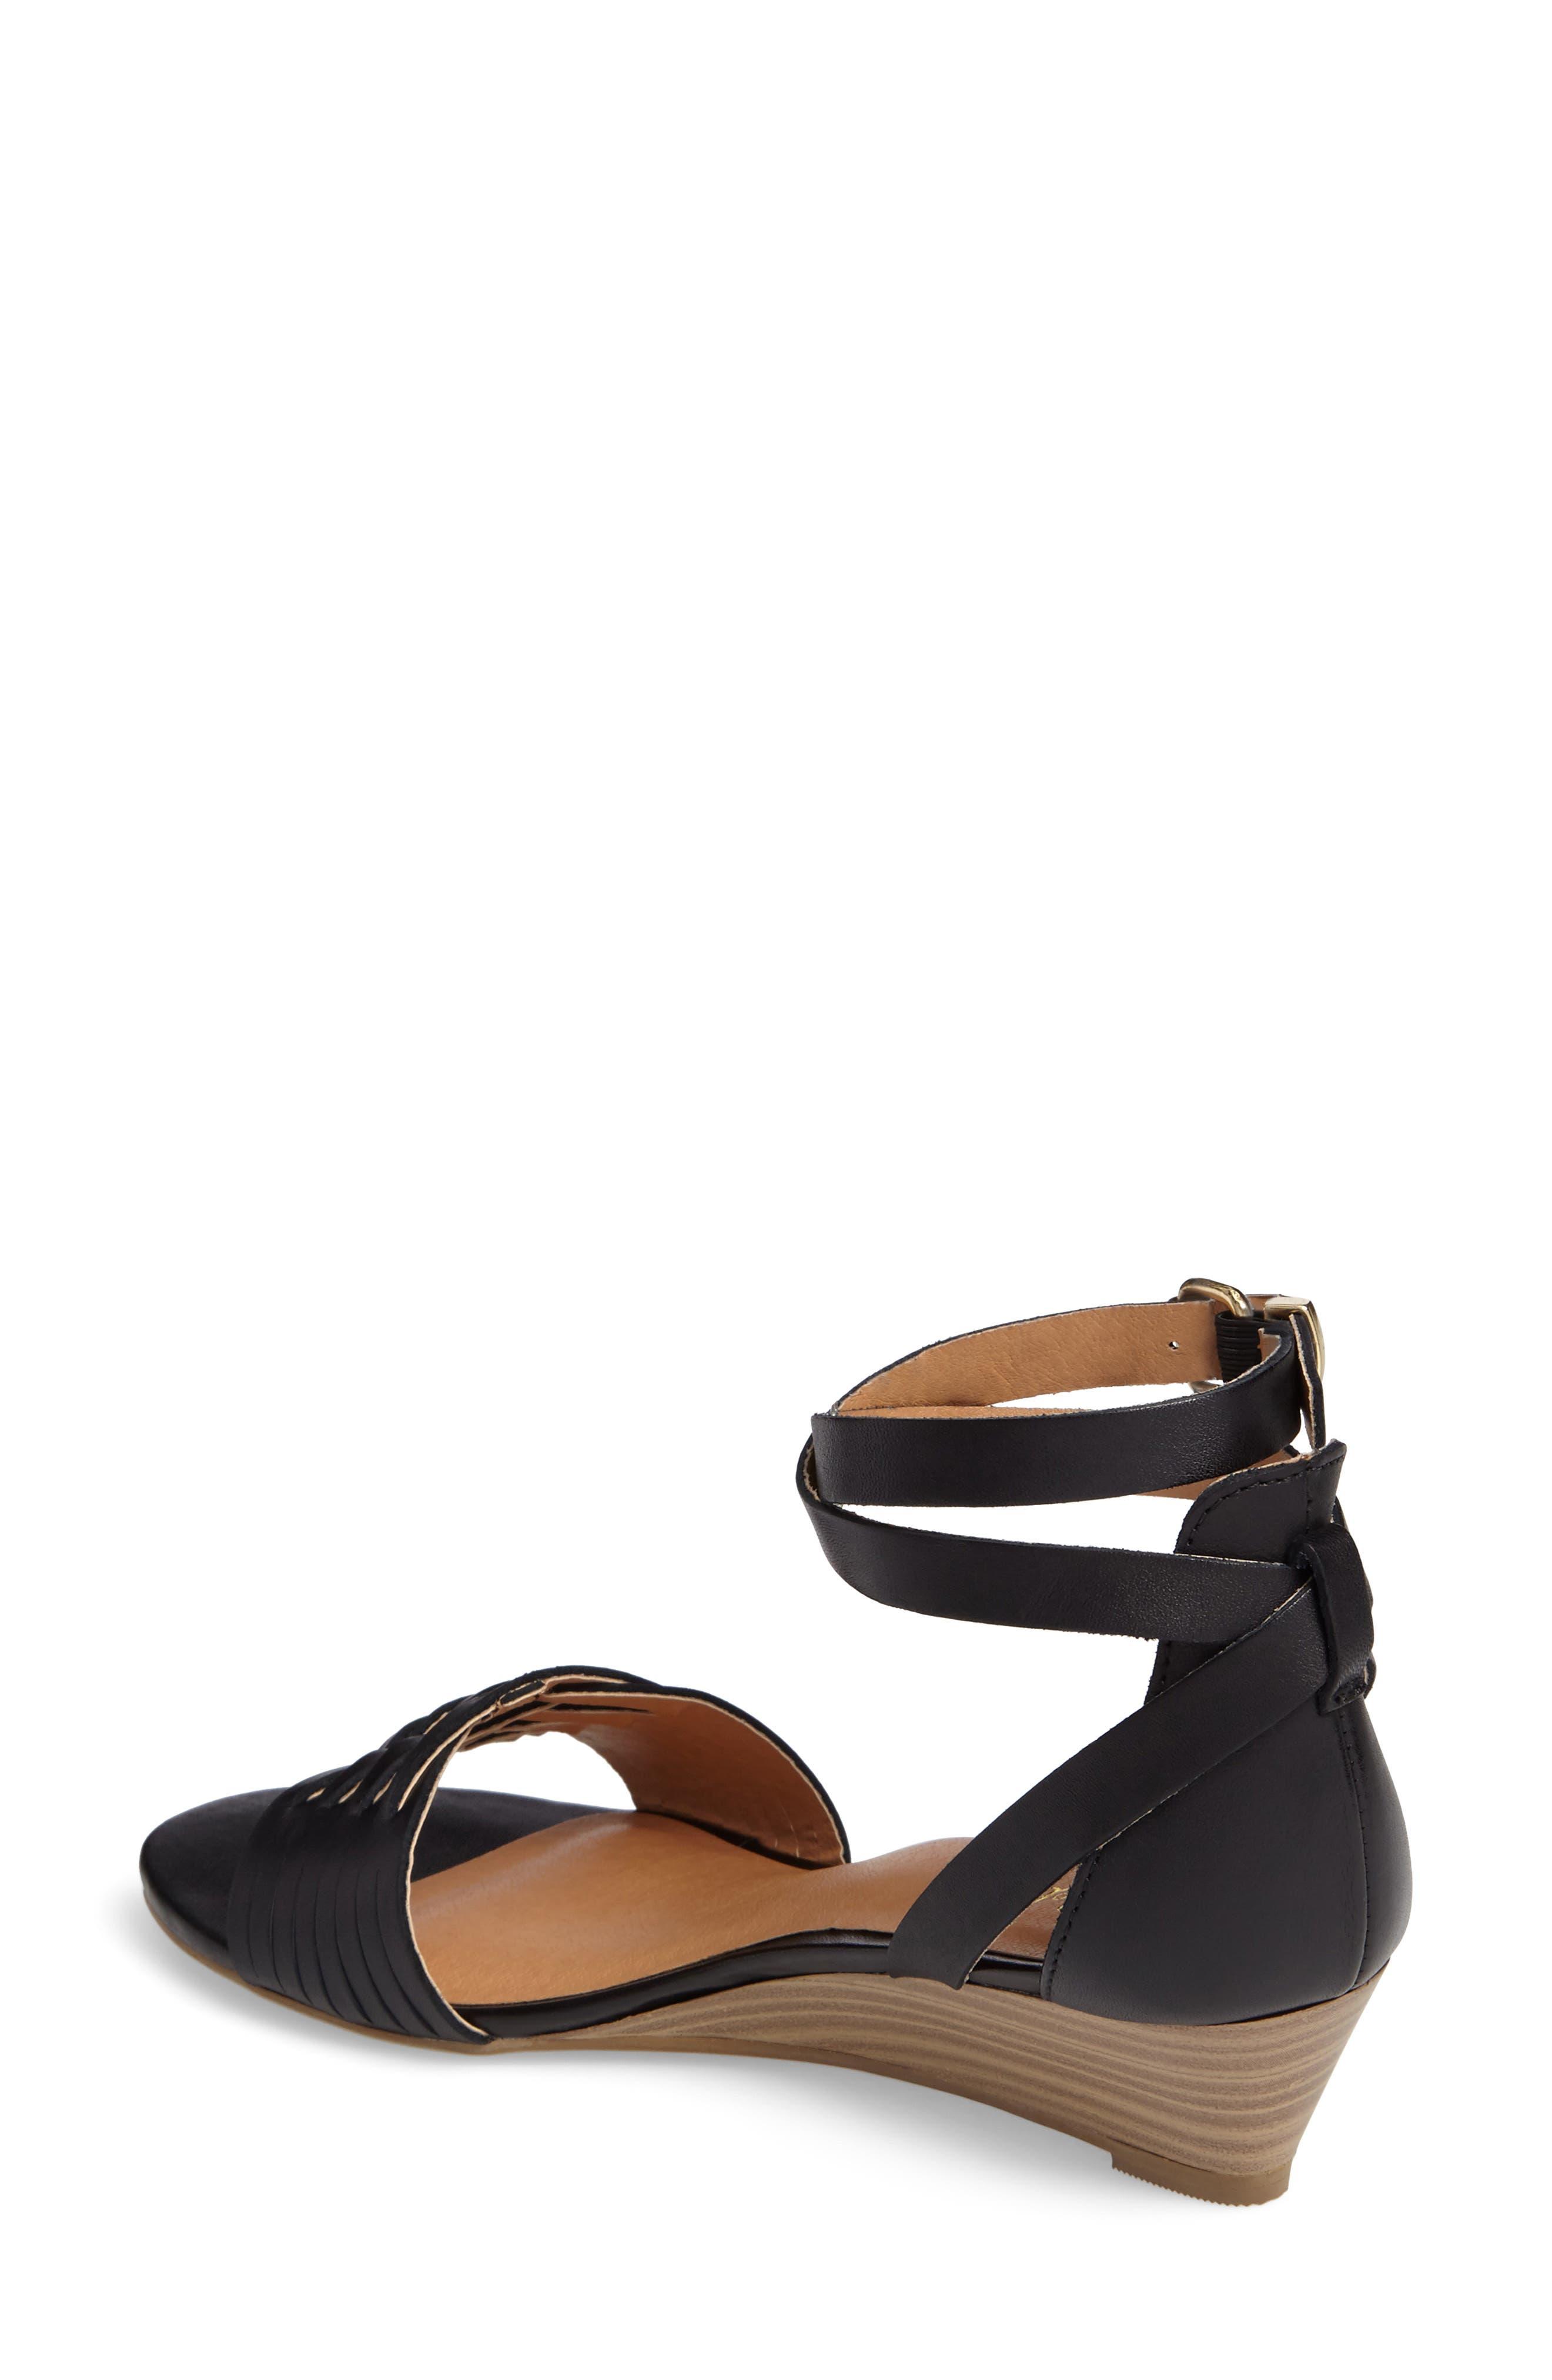 Sincere Wraparound Wedge Sandal,                             Alternate thumbnail 2, color,                             001